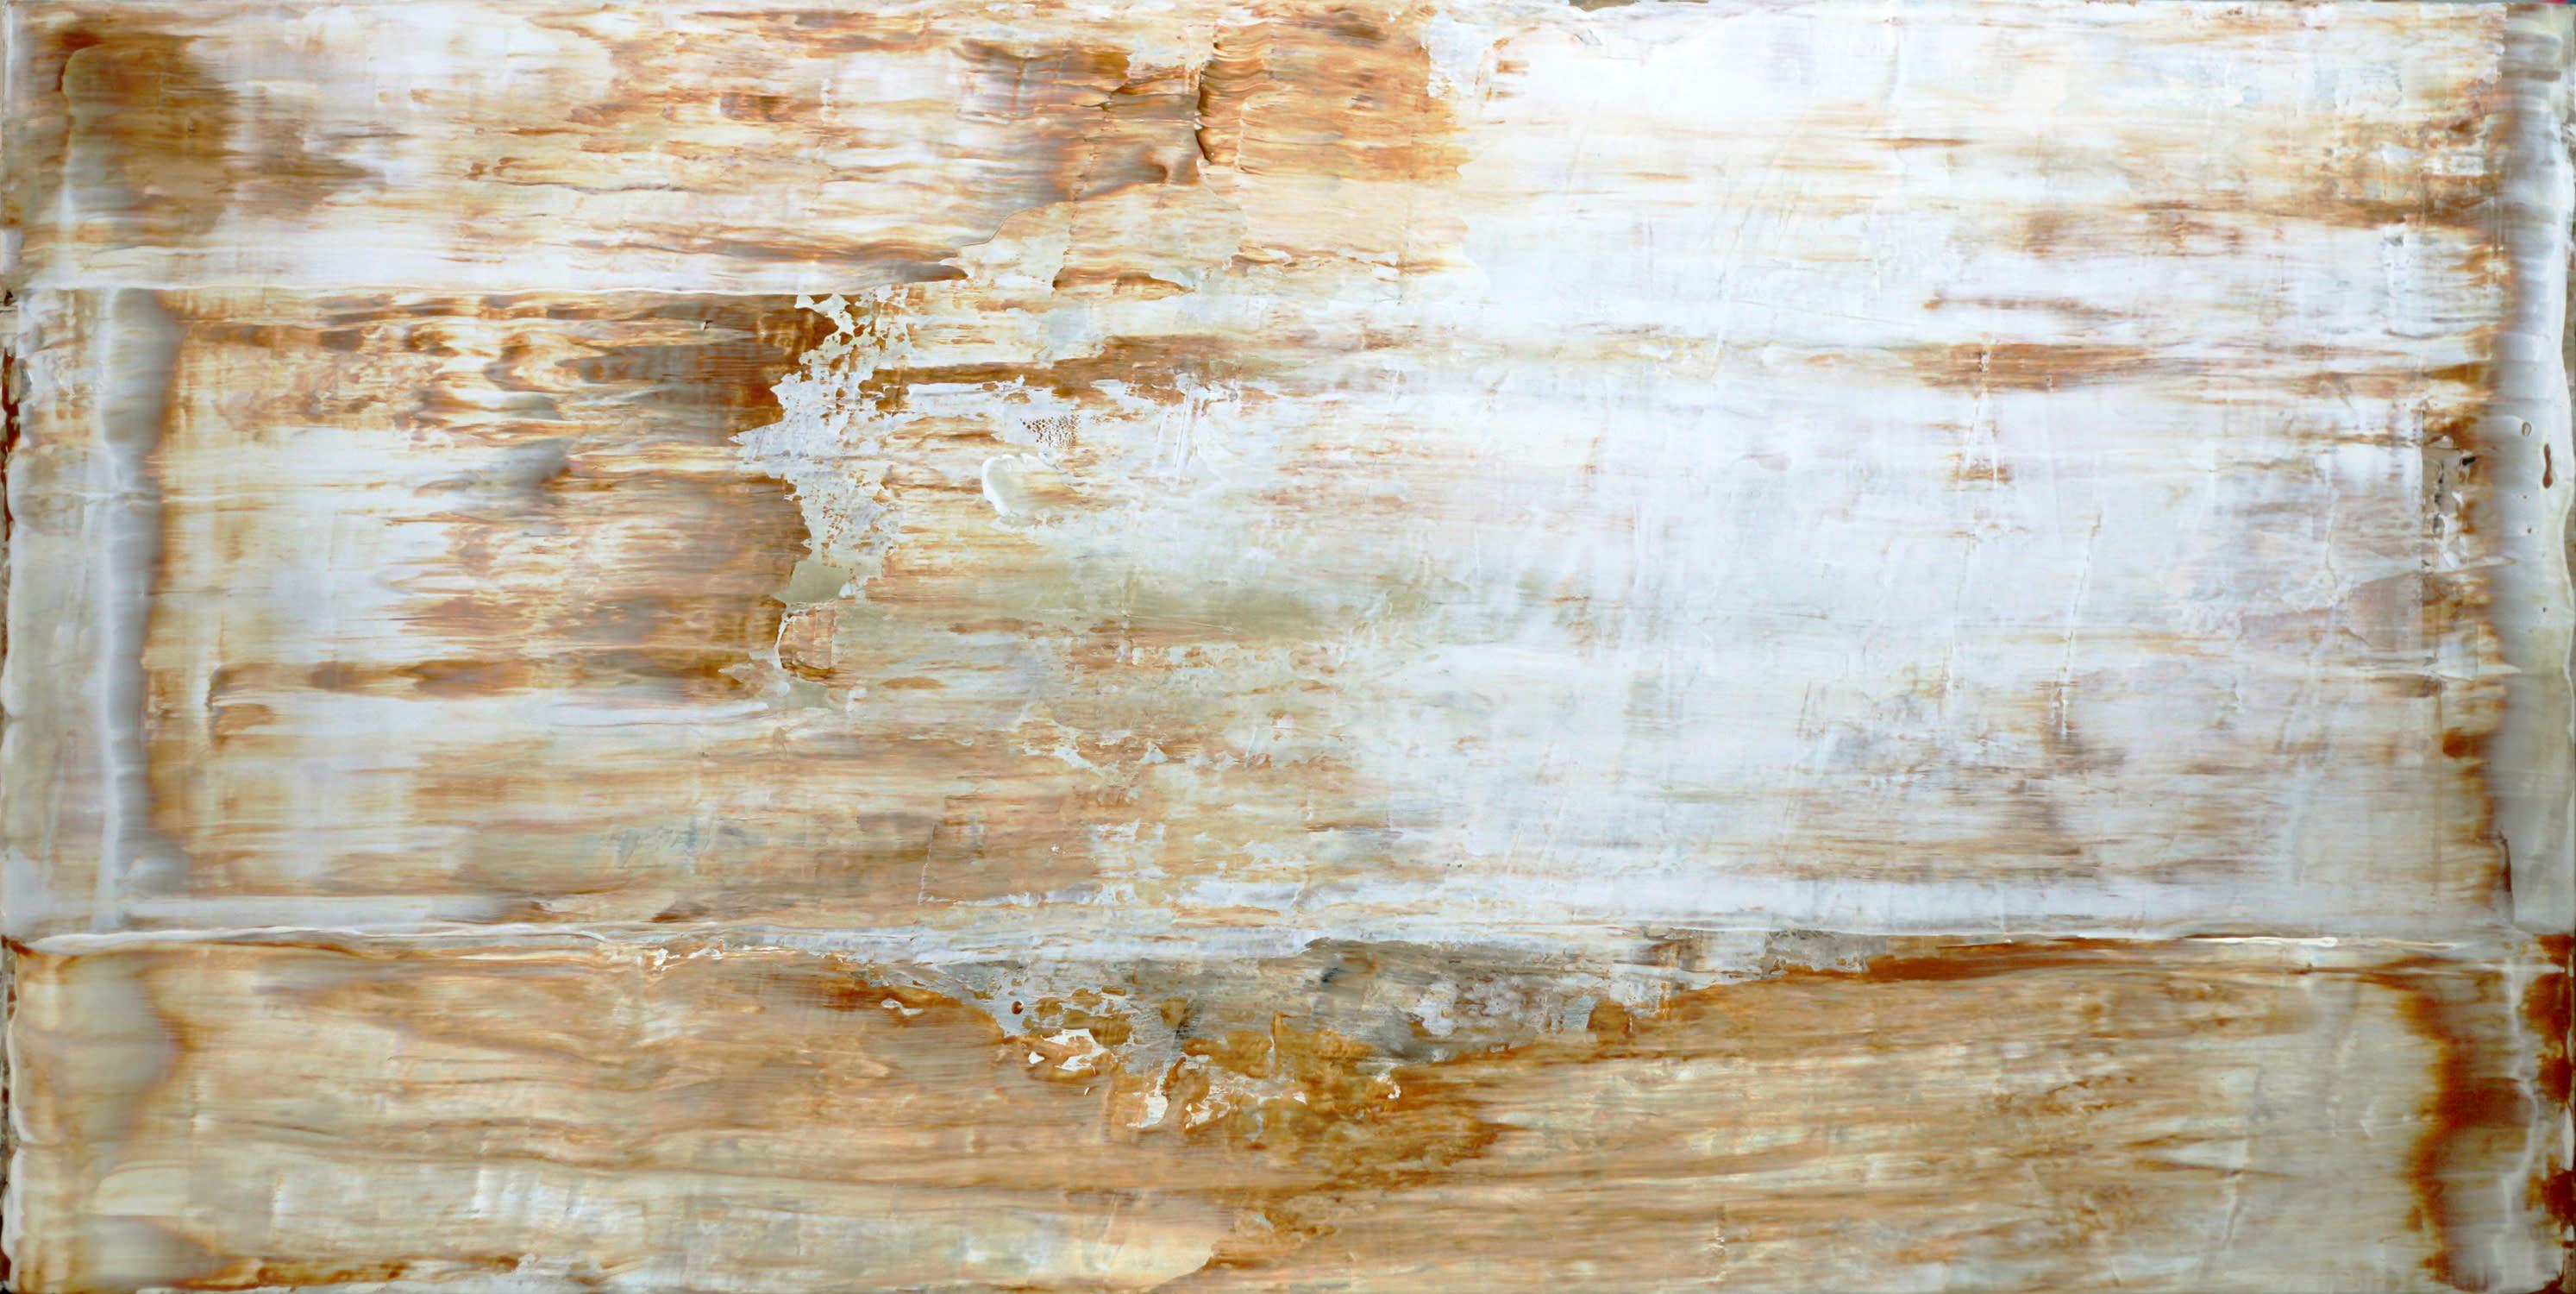 Amber waves smaller dququa